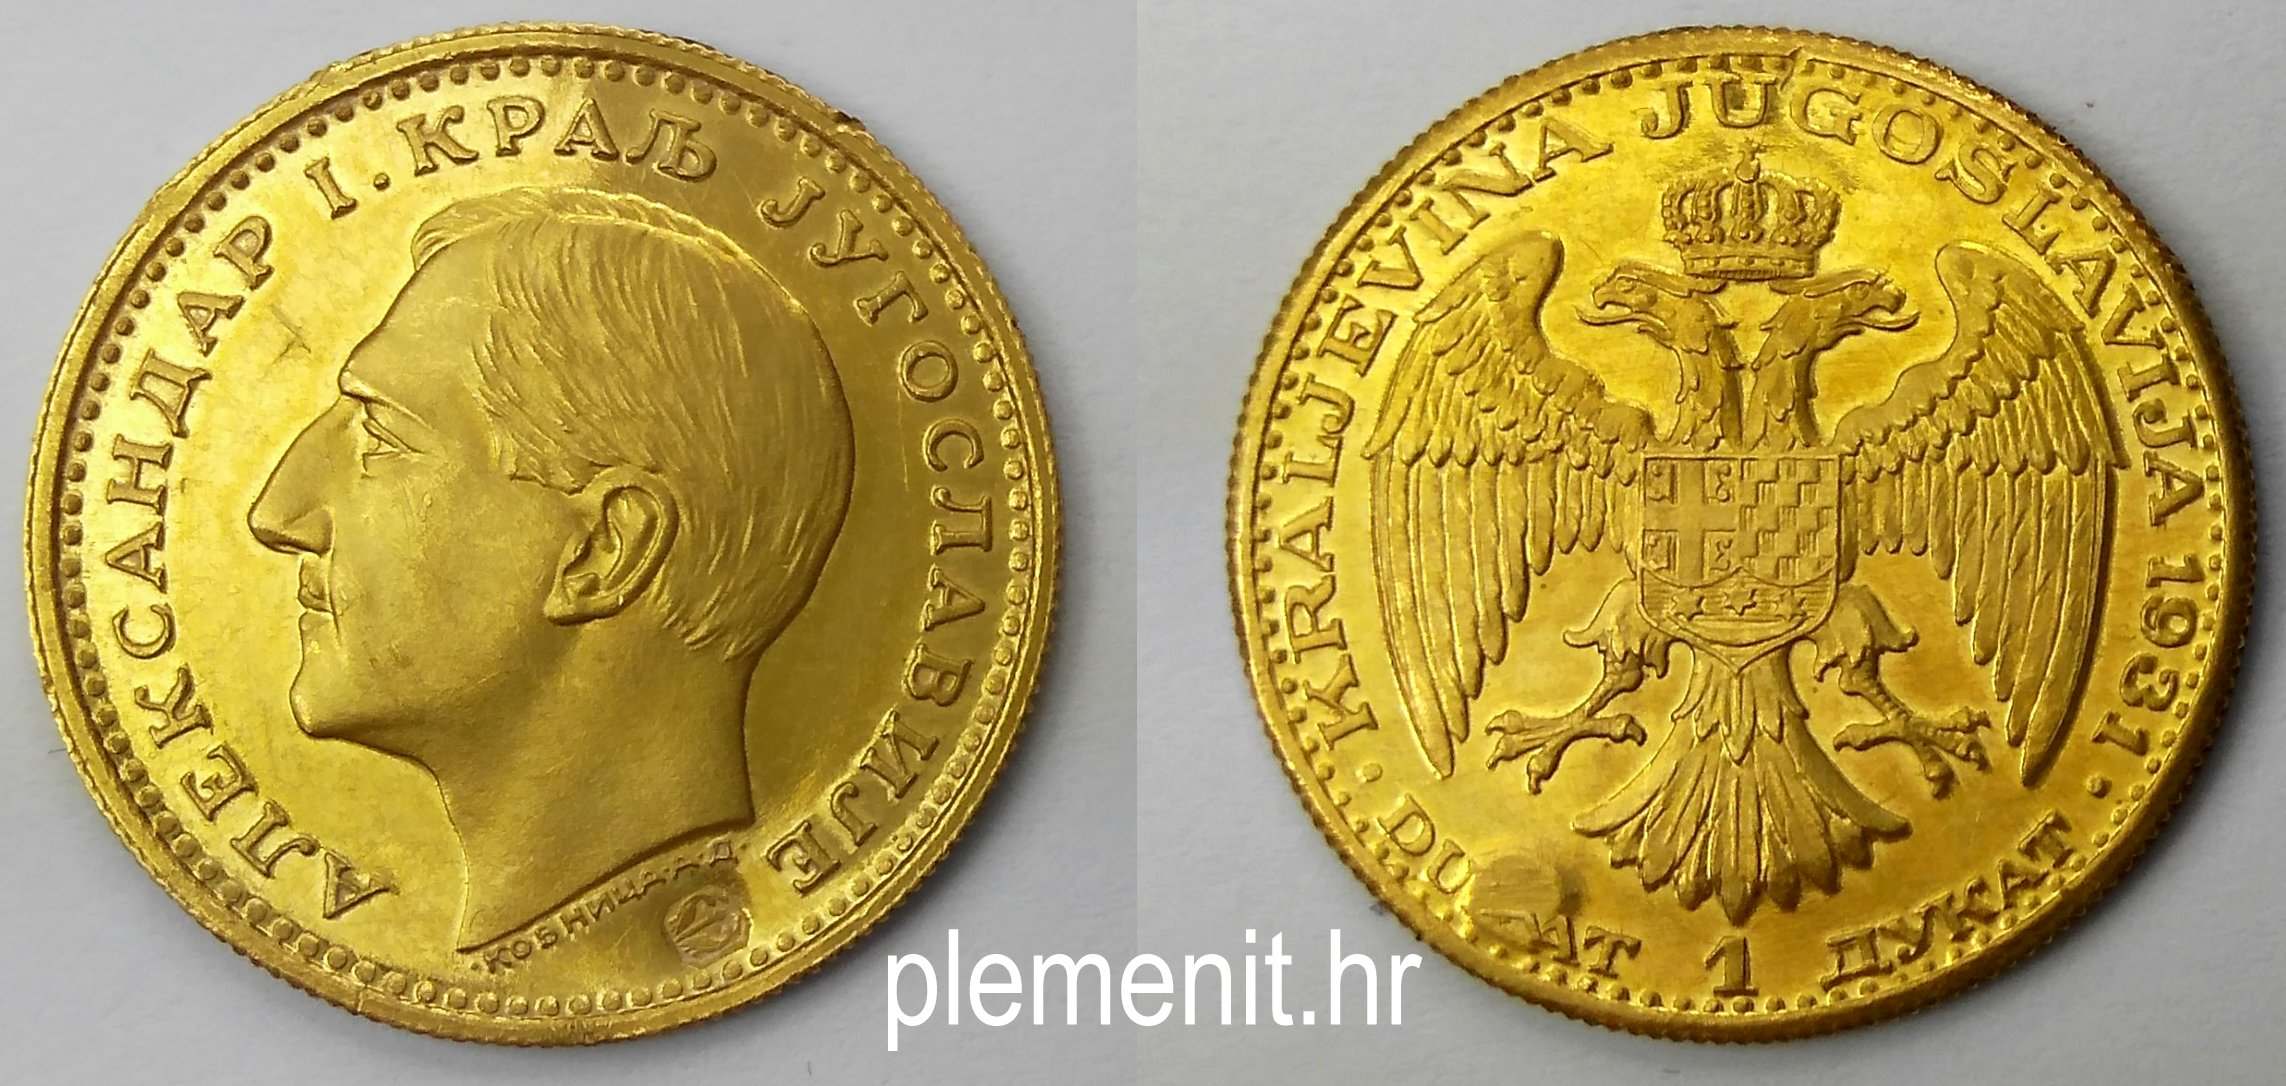 Zlatni dukat kralj Aleksandar I 1931 Kraljevina Jugoslavija